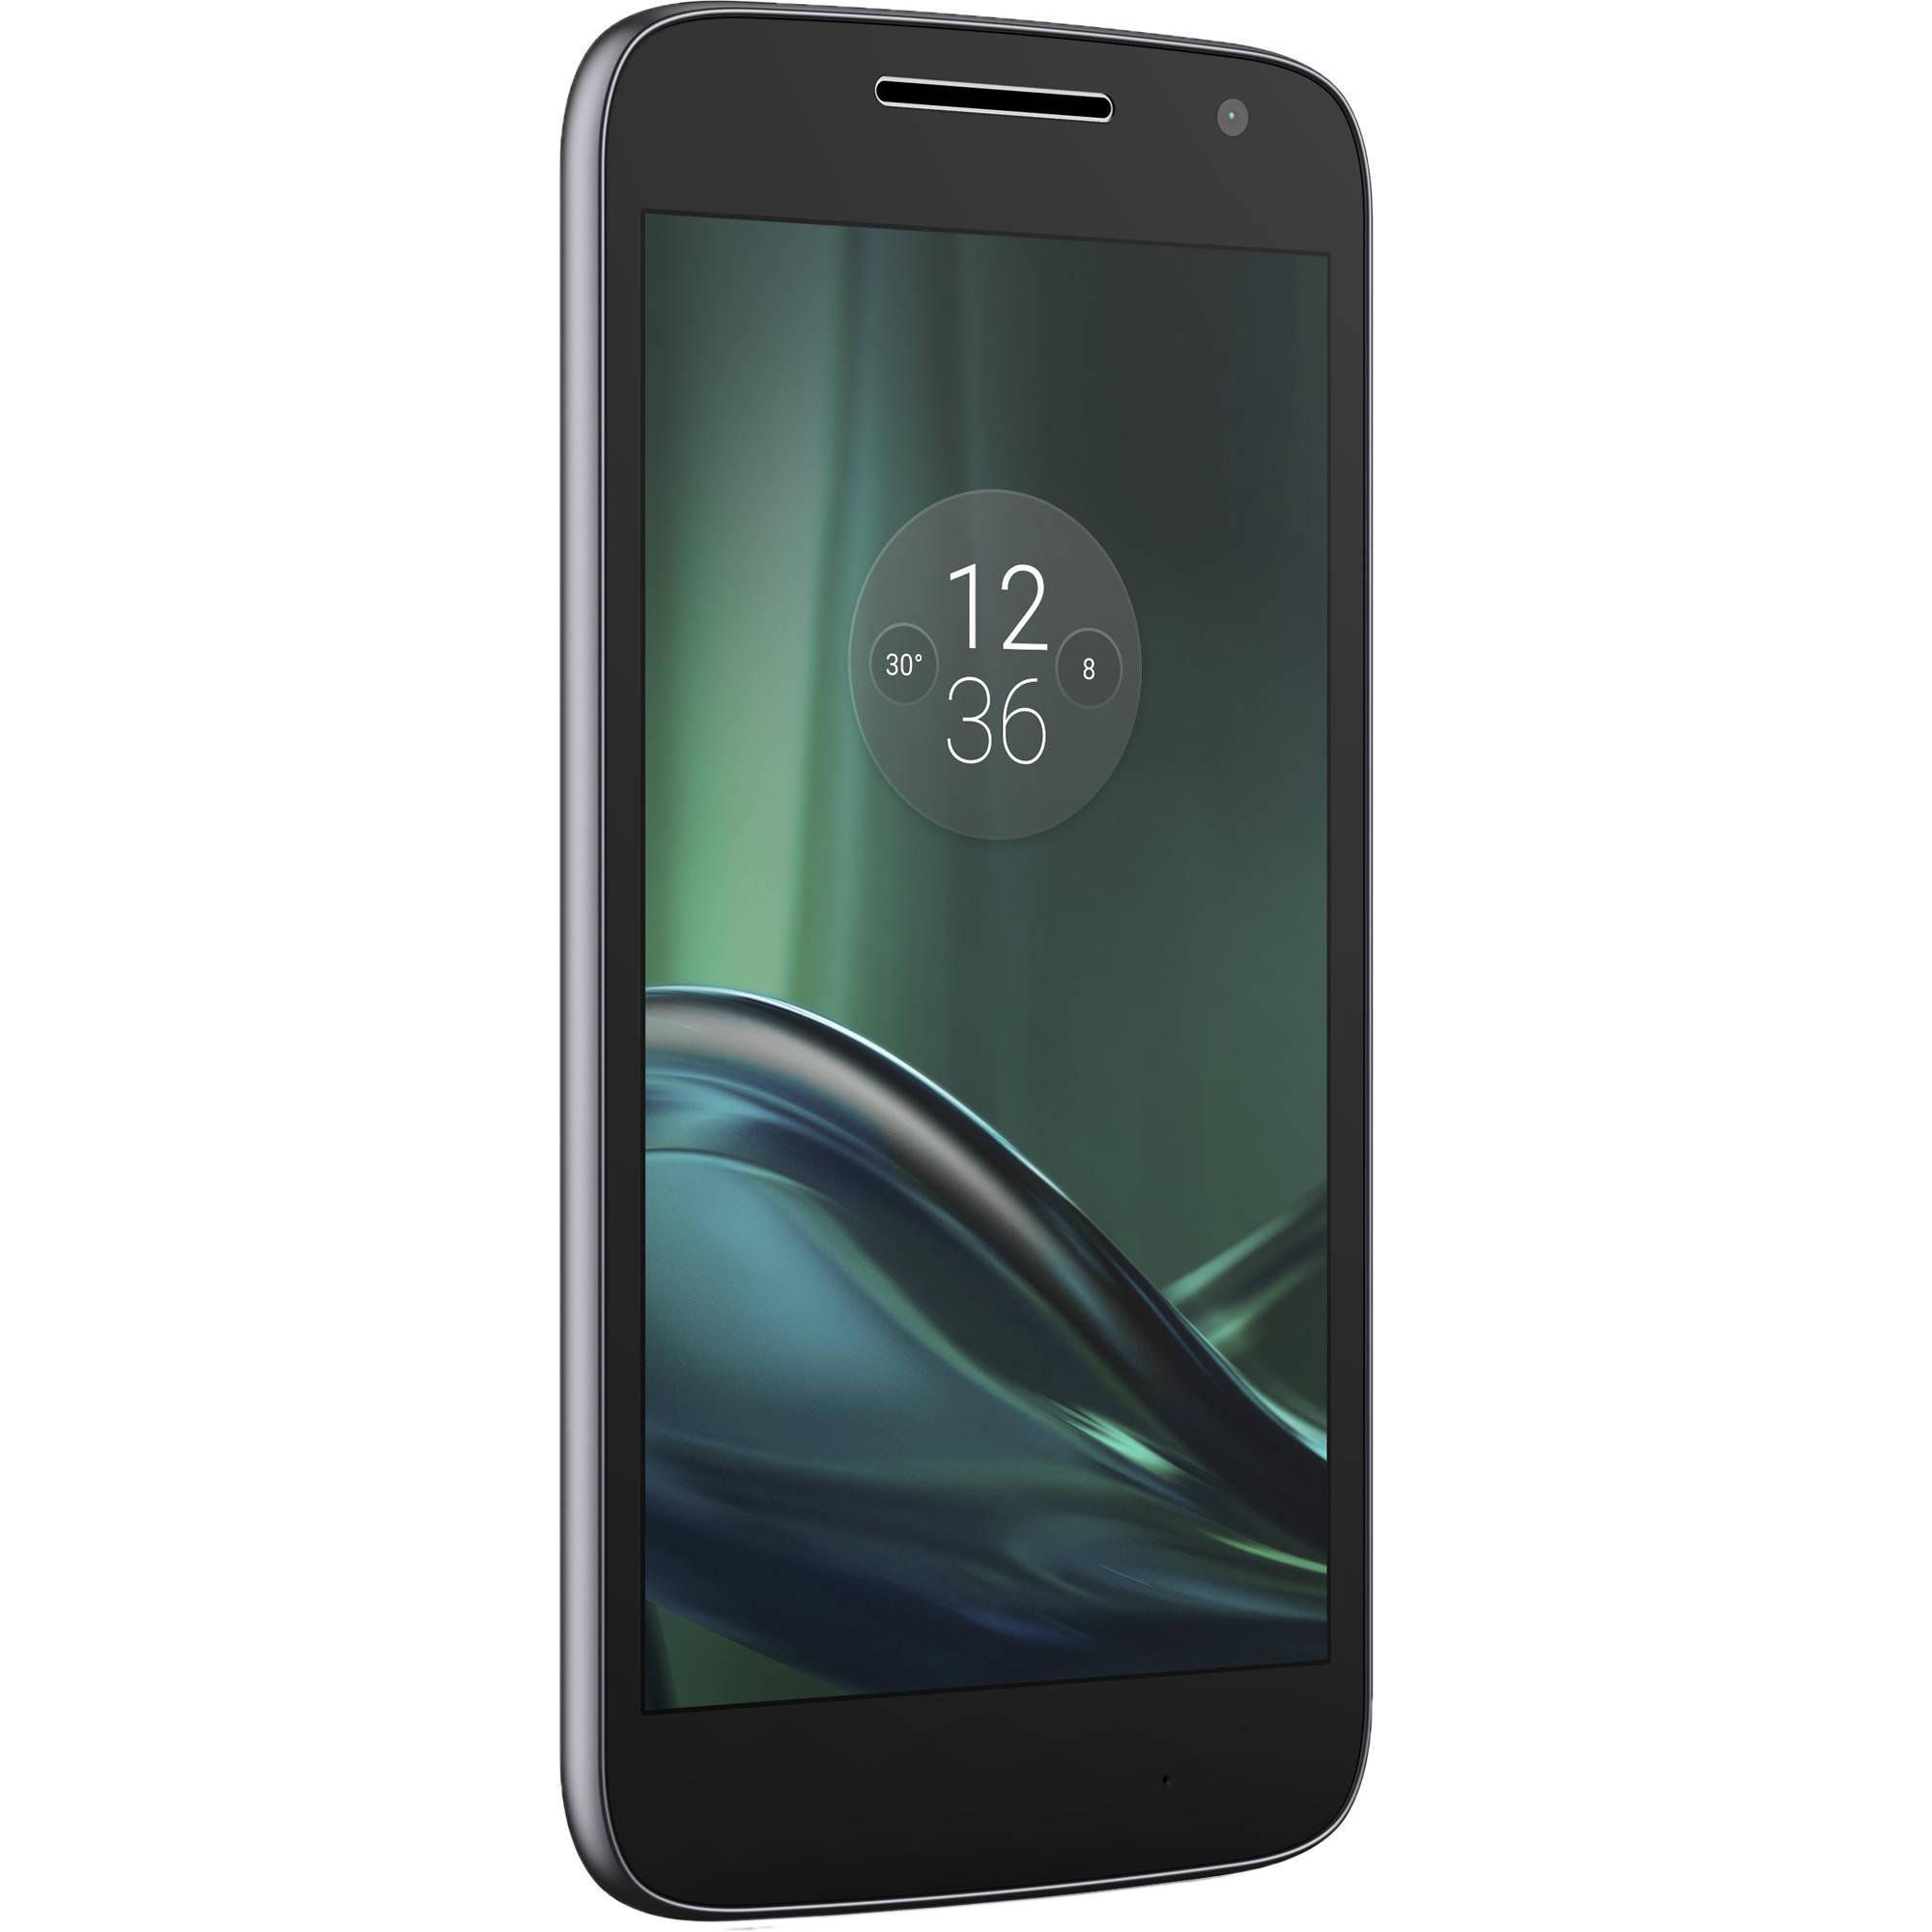 motorola 4th generation. moto g play xt1607 4th gen. 16gb smartphone (unlocked, black) motorola generation e